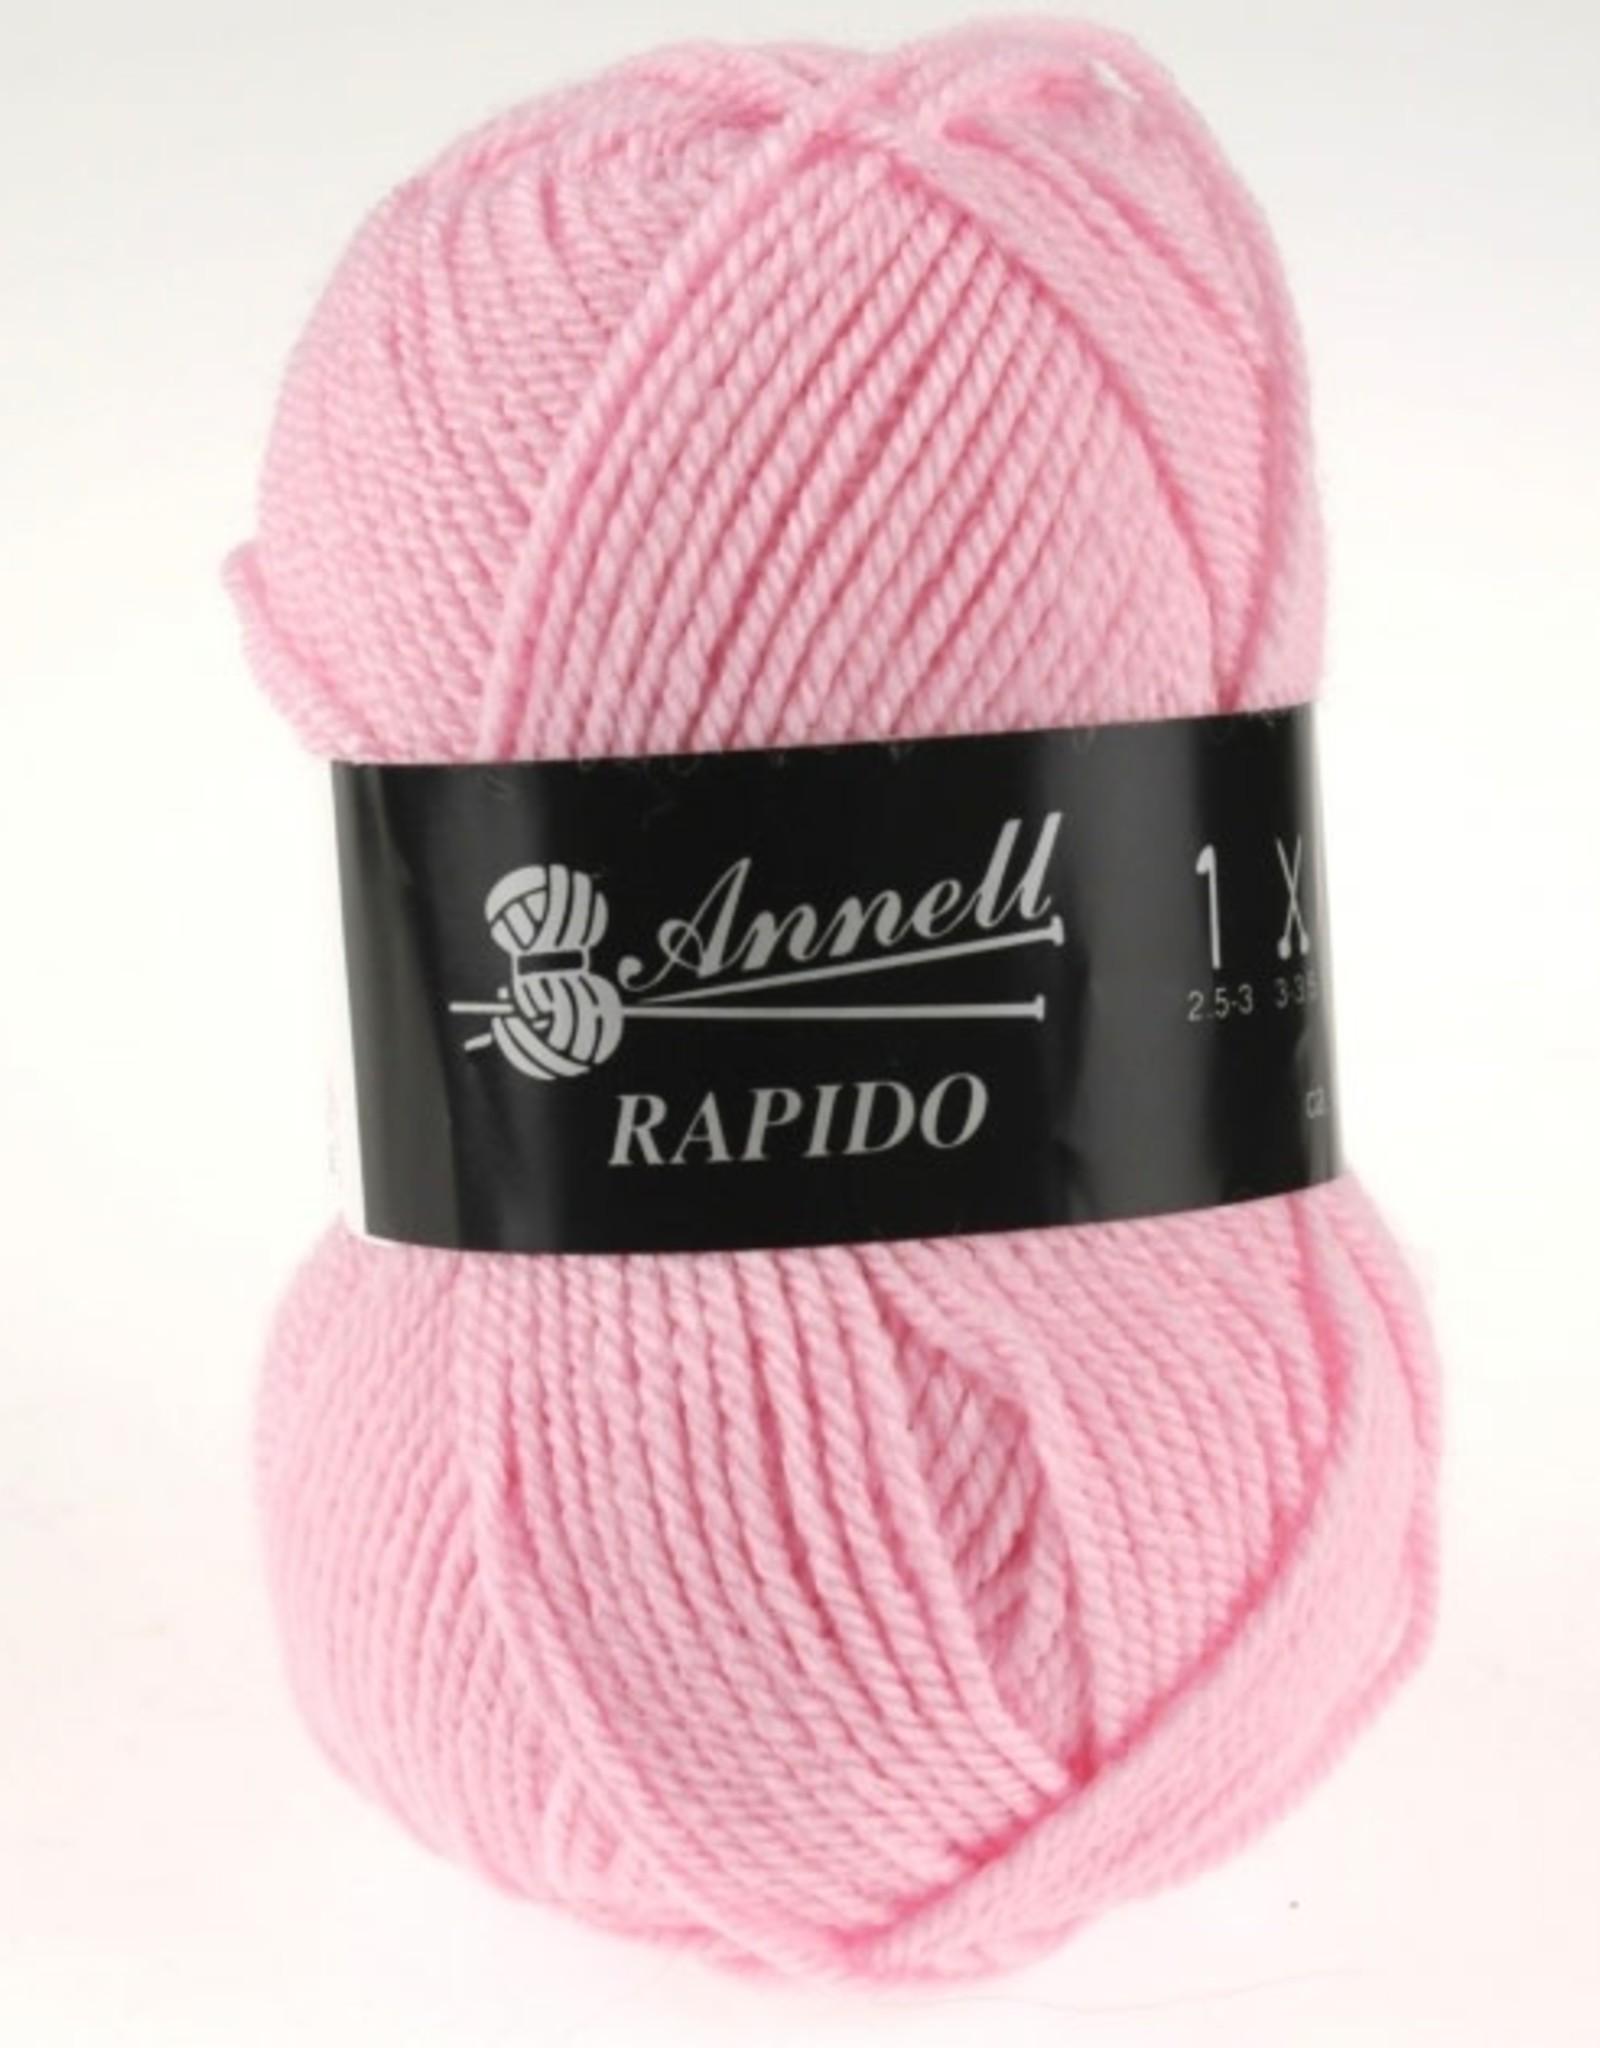 Annell Annell rapido 3233